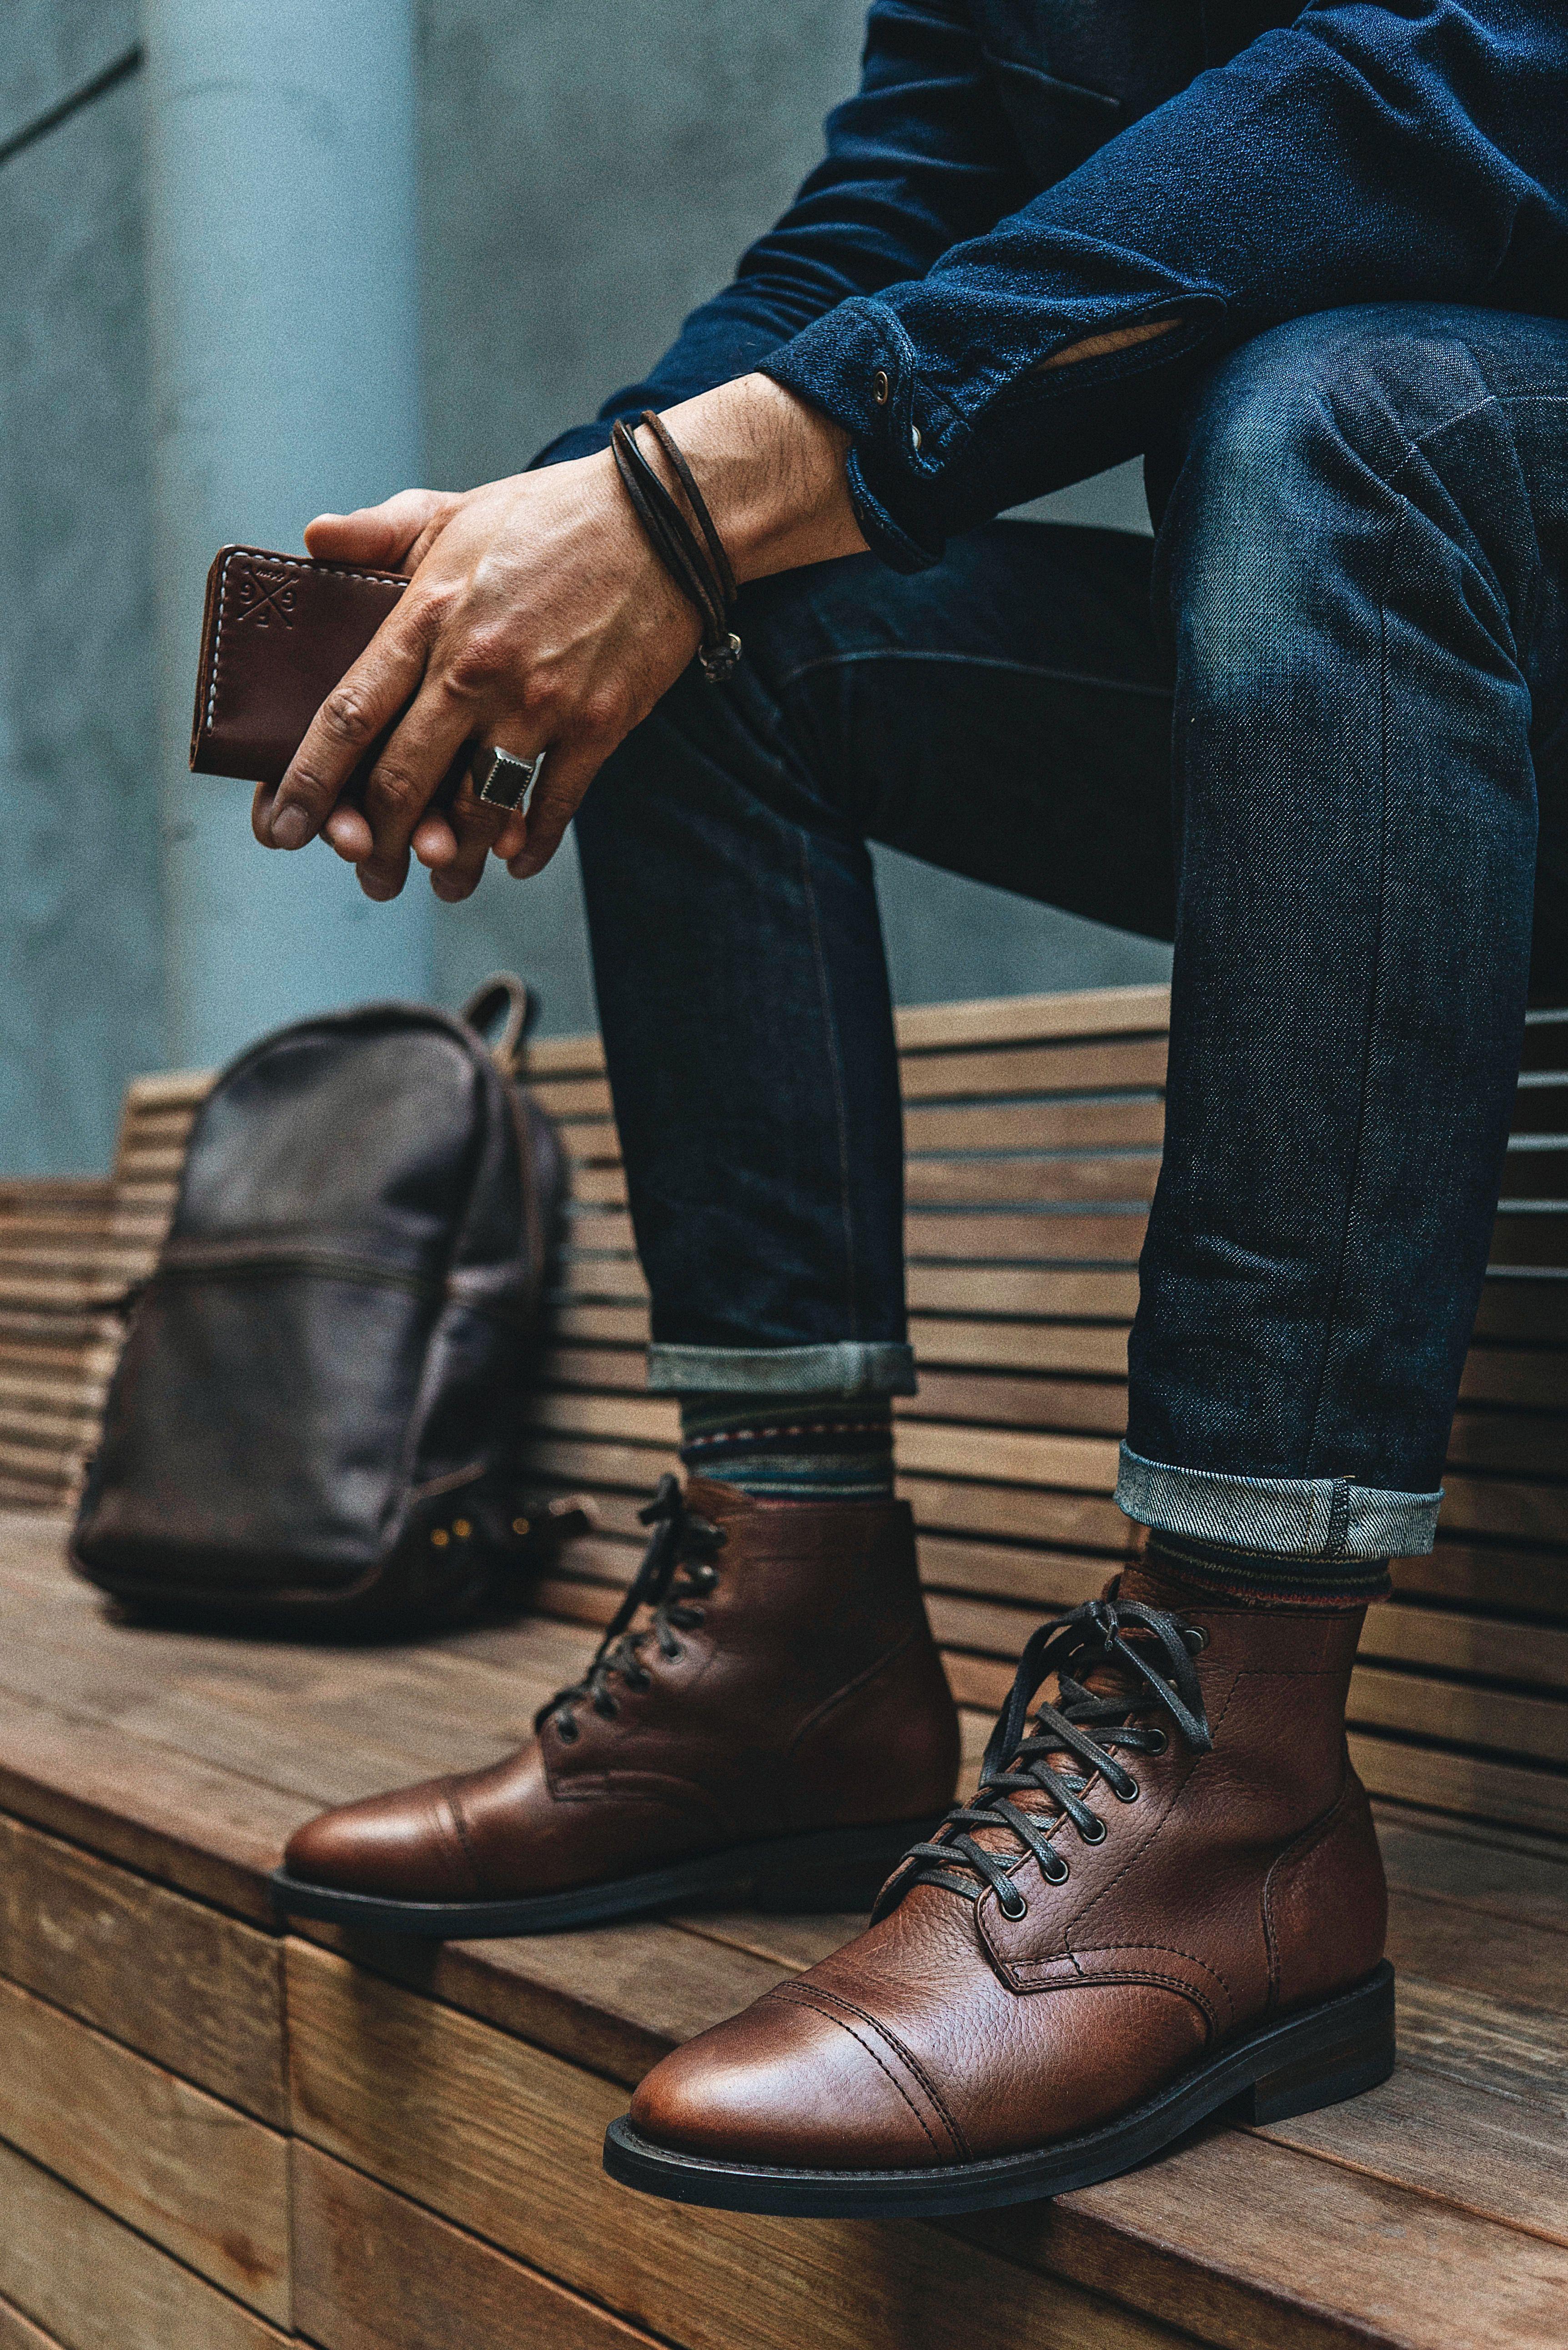 Pin on Men's Captain Boots | Thursday